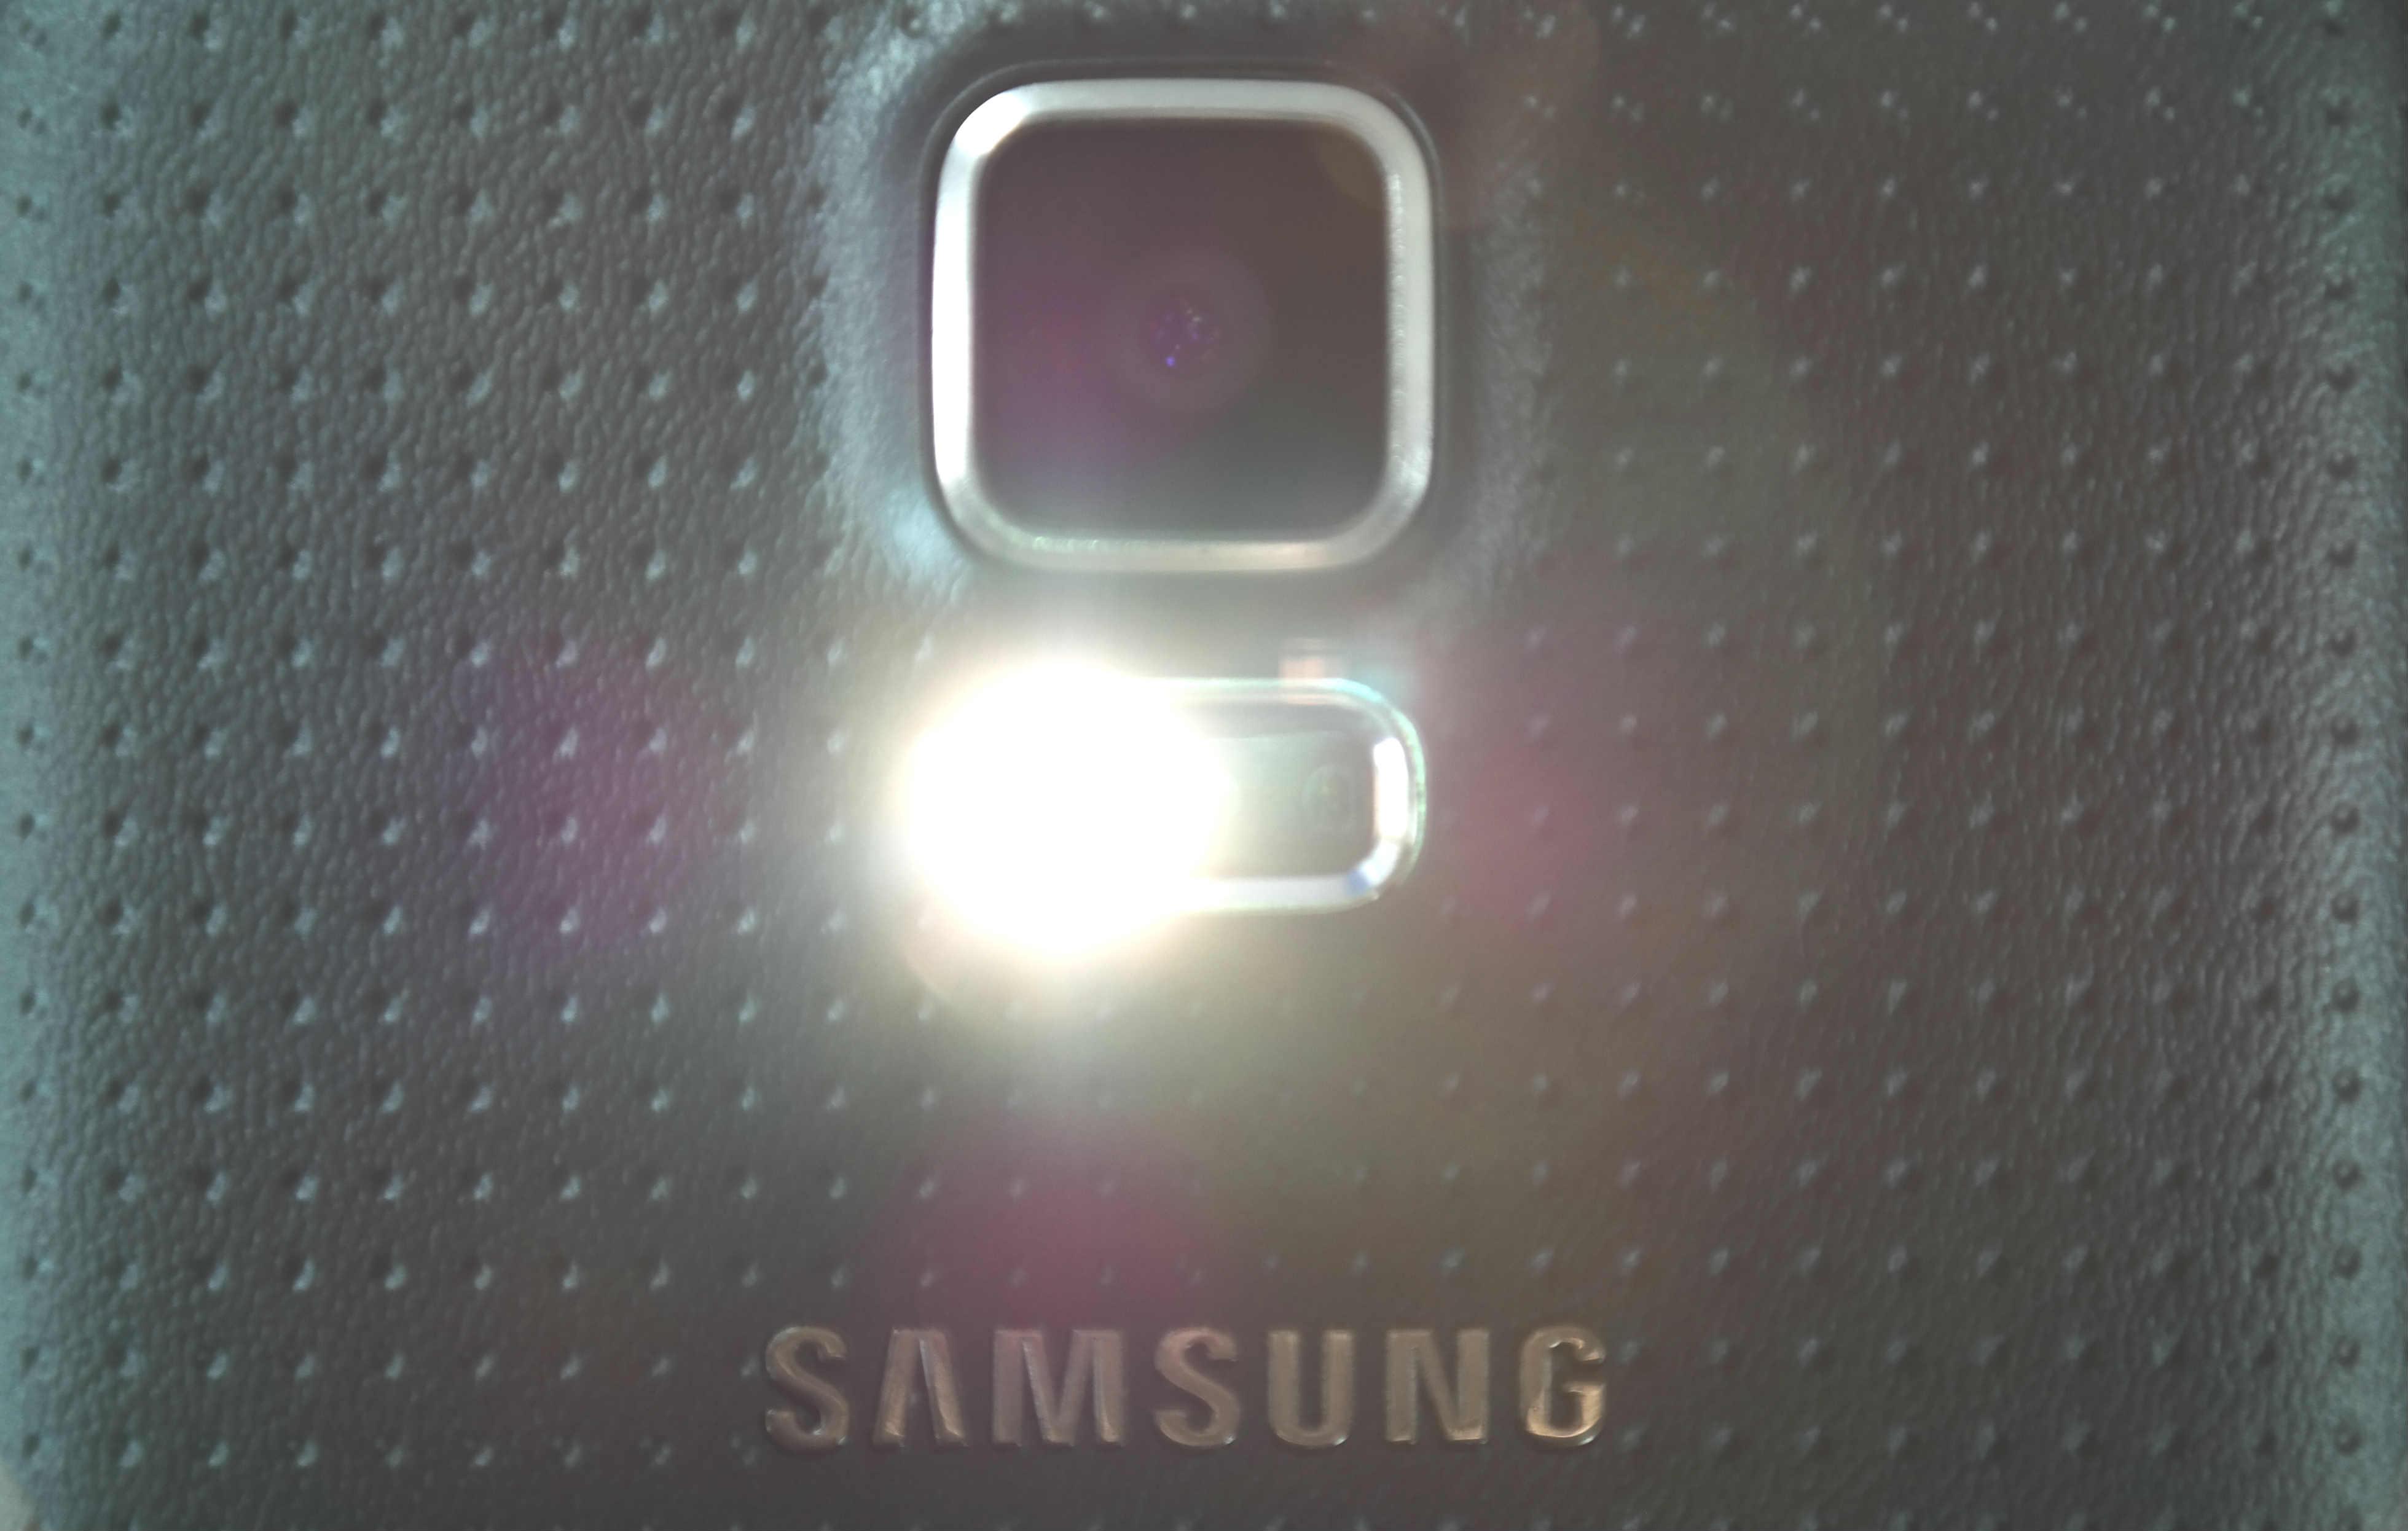 Samsung e2120, Yo te re banco.